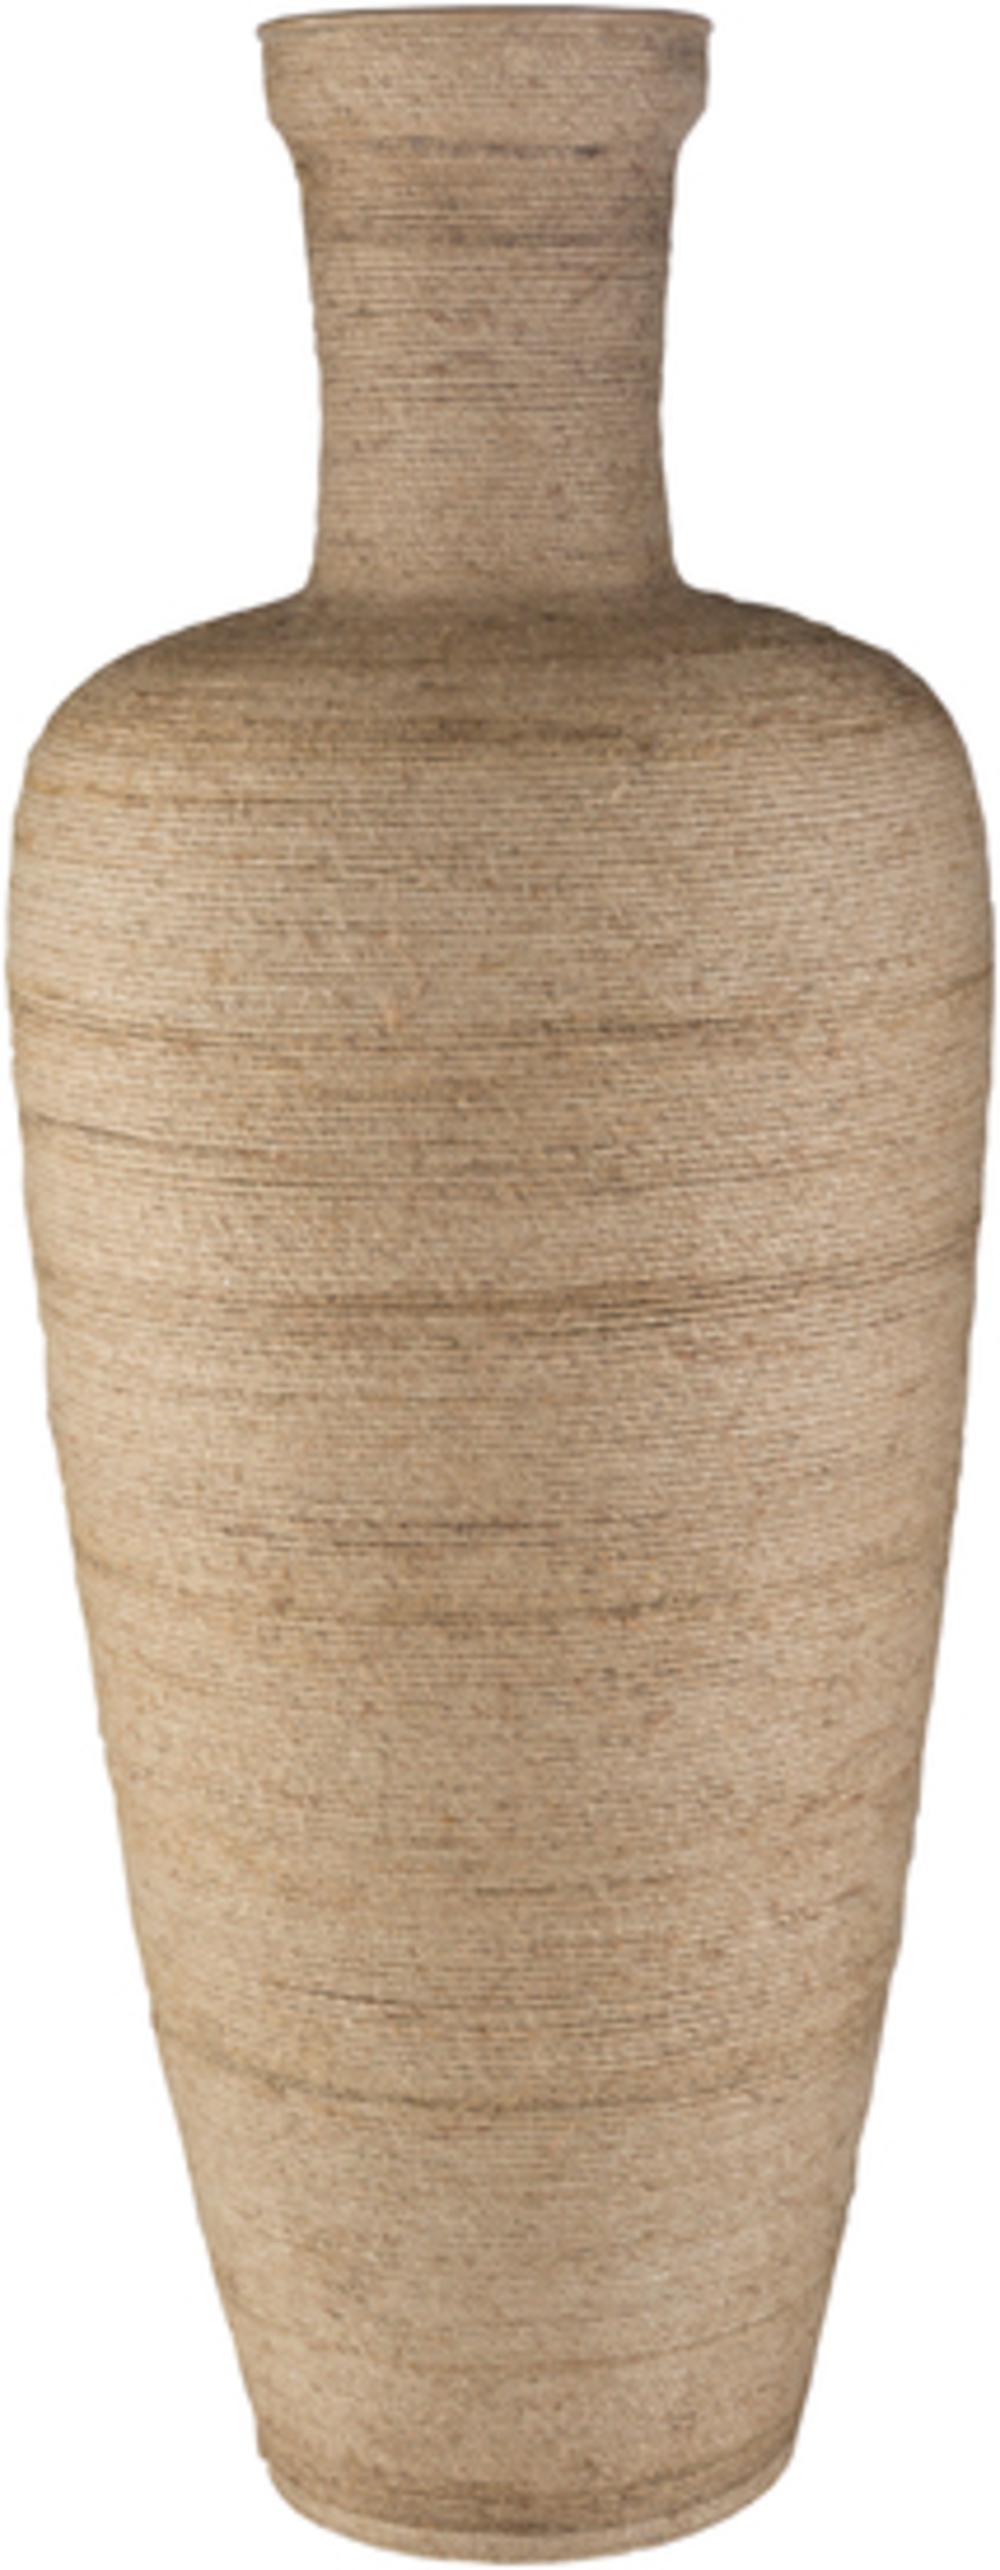 Surya - Sandlewood Vase